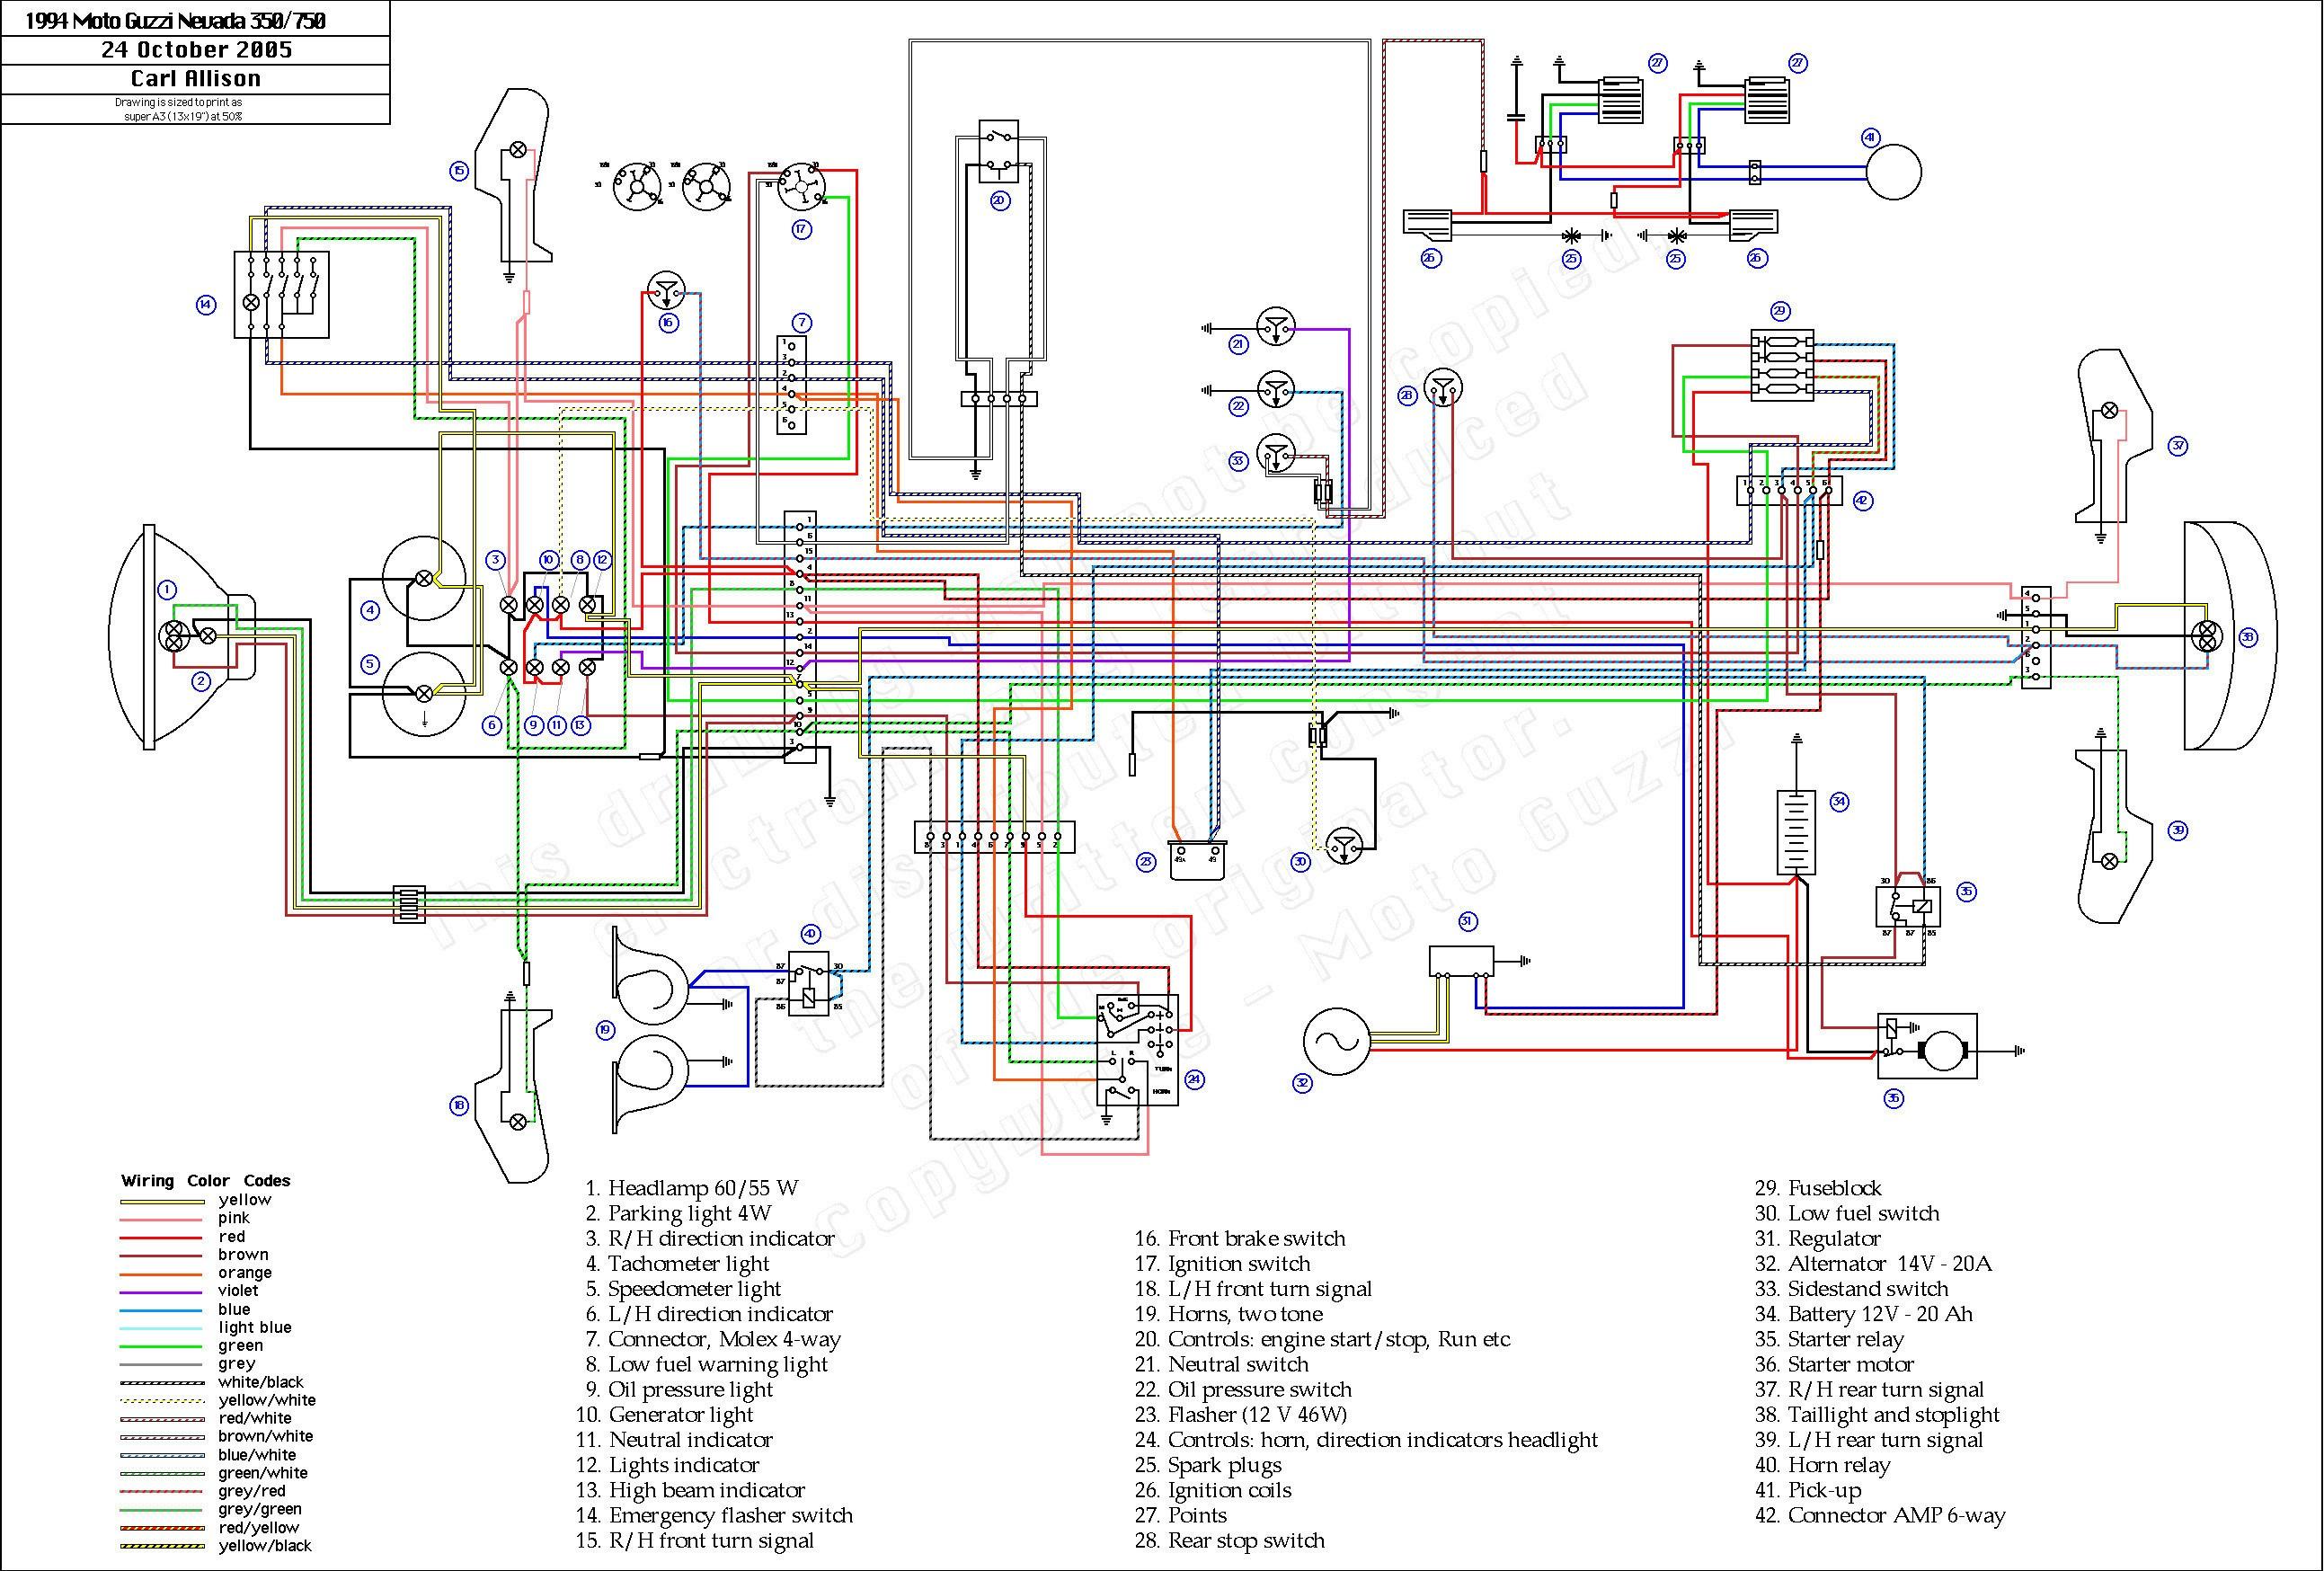 08 Zx10r Wire Diagram -Farmall International Tractor Wiring Diagram |  Begeboy Wiring Diagram SourceBegeboy Wiring Diagram Source